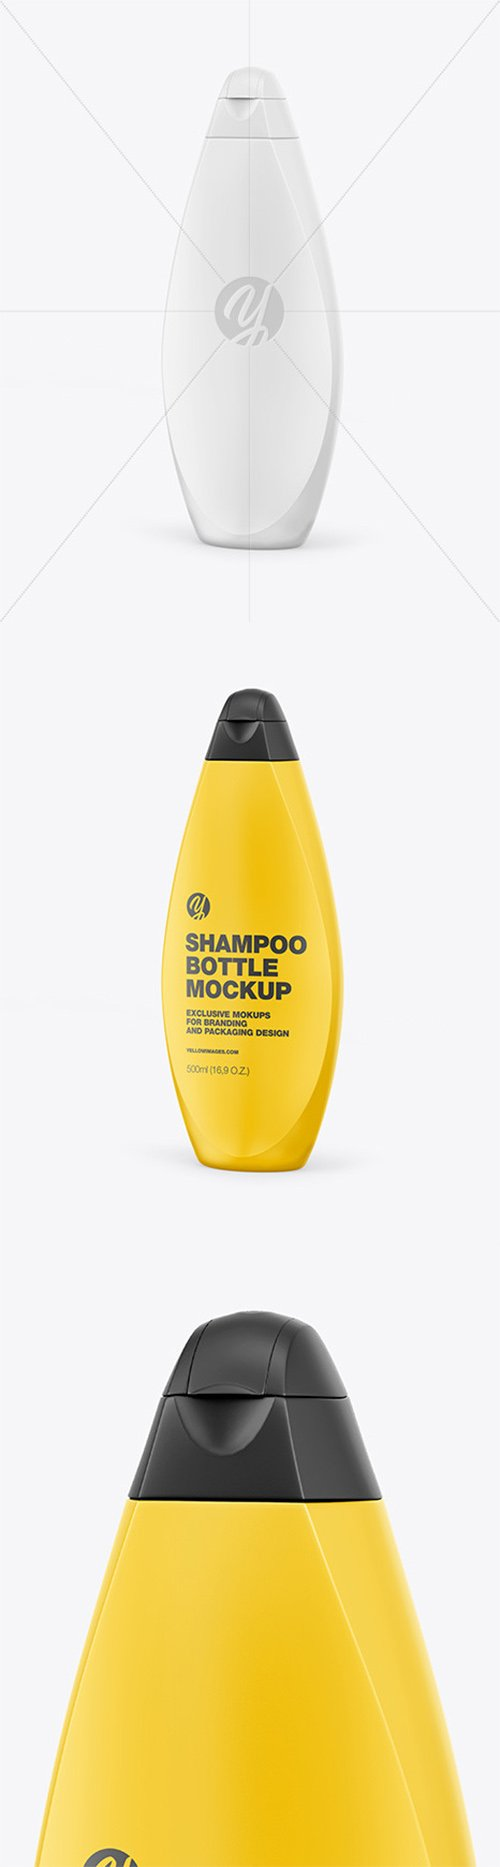 Plastic Shampoo Bottle Mockup - Half Side View 64020